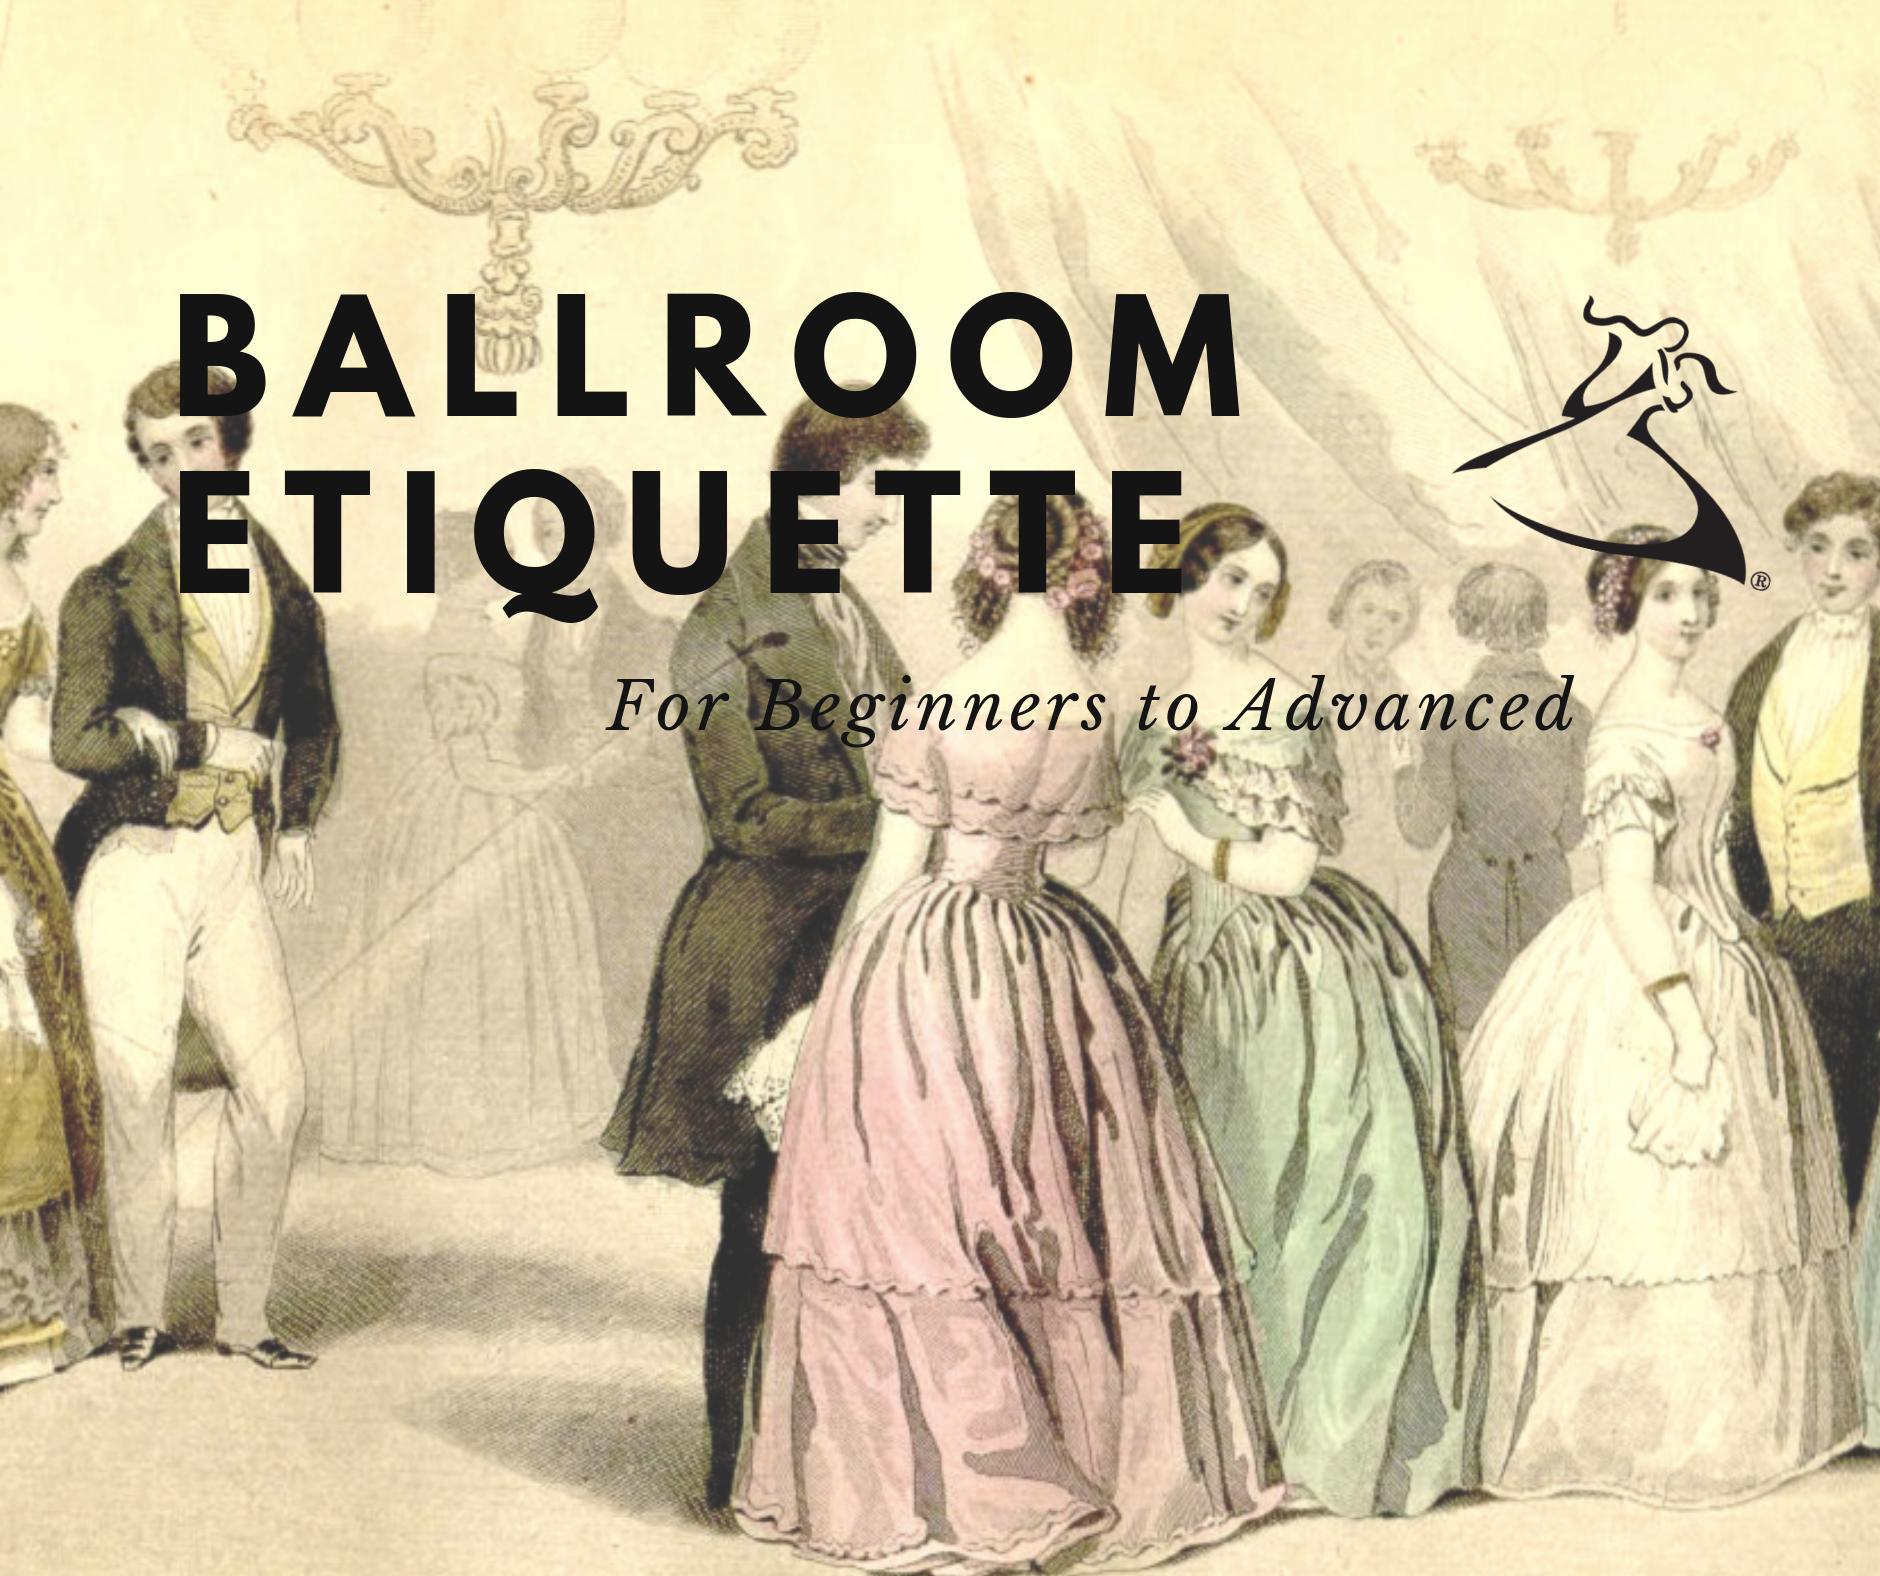 Ballroom etiquette.png